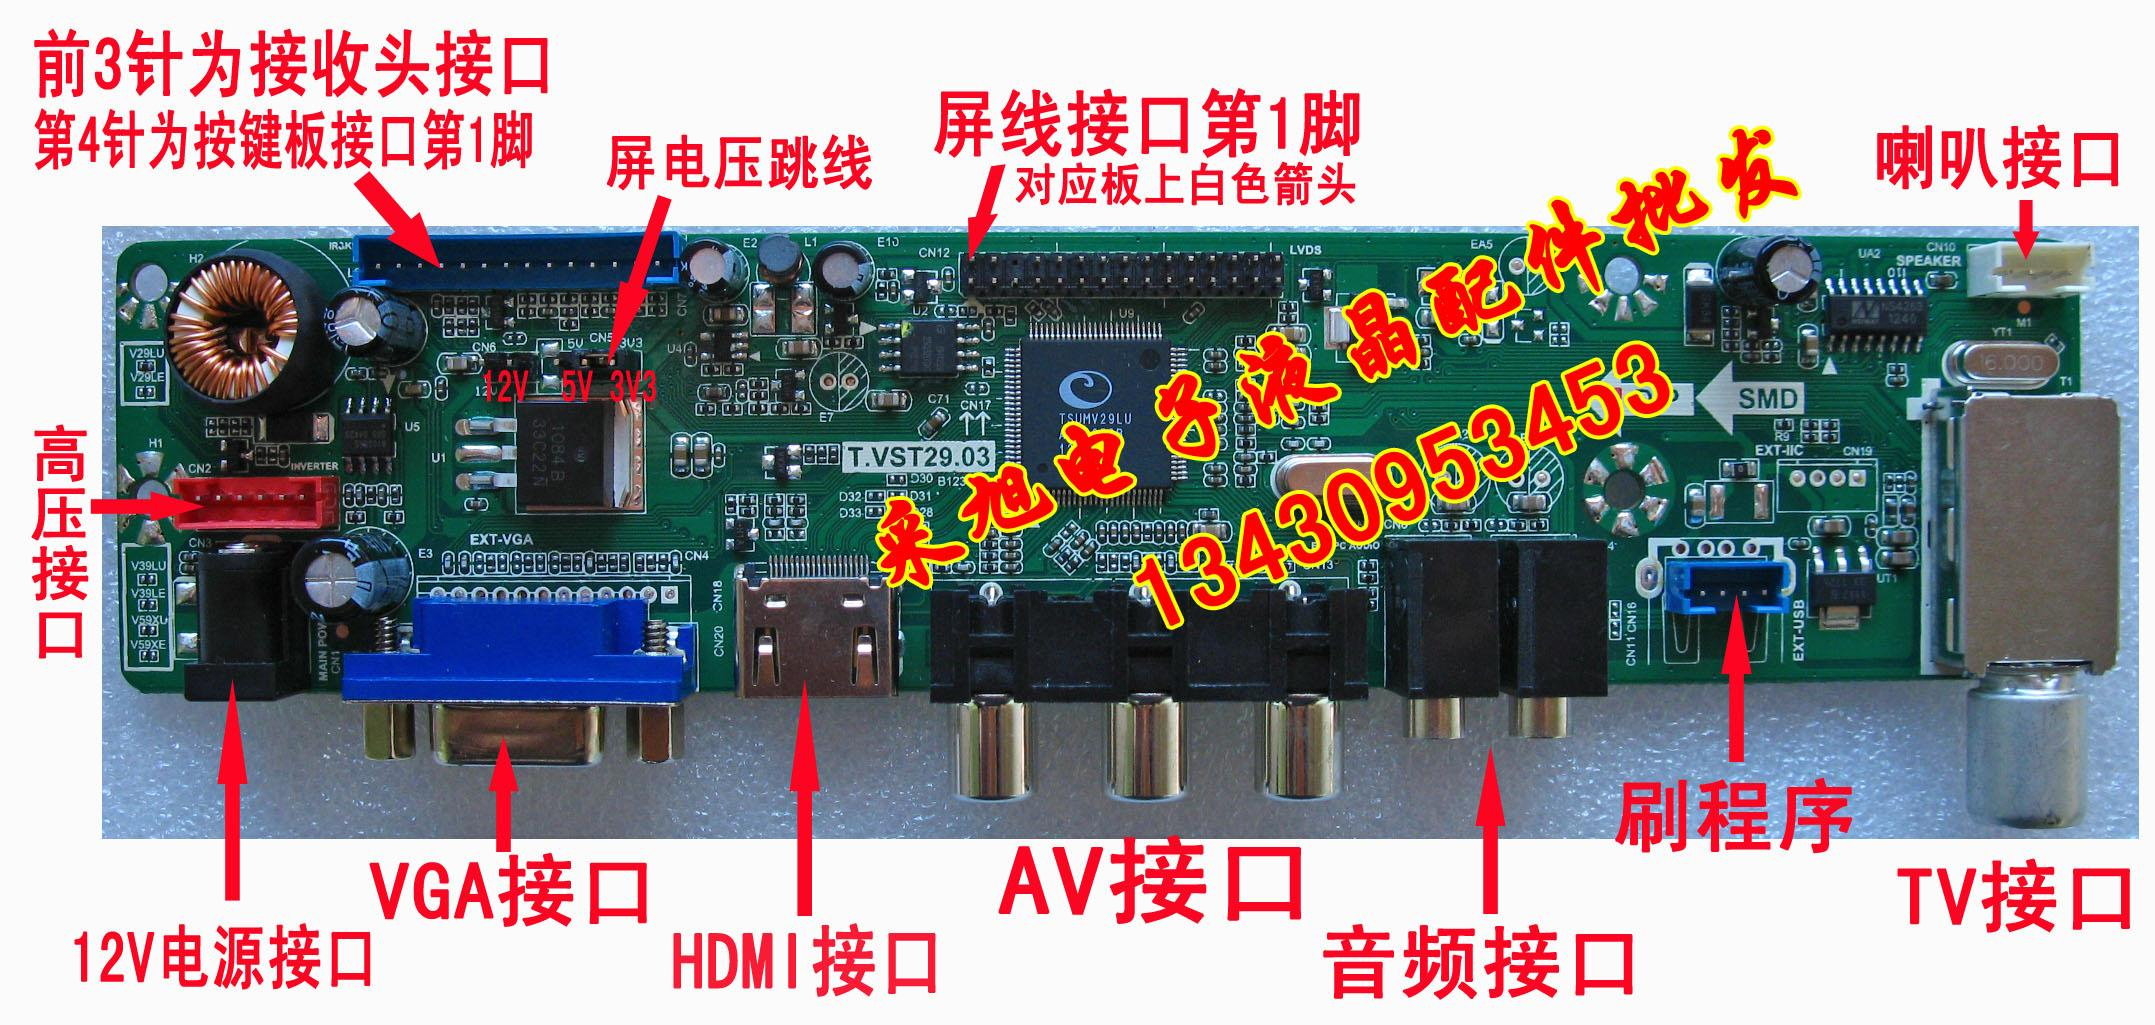 ԭװ�ֻ�TV��T.VST29.03 ң�� �ֻ�V29 HDMI���� С�ߴ����